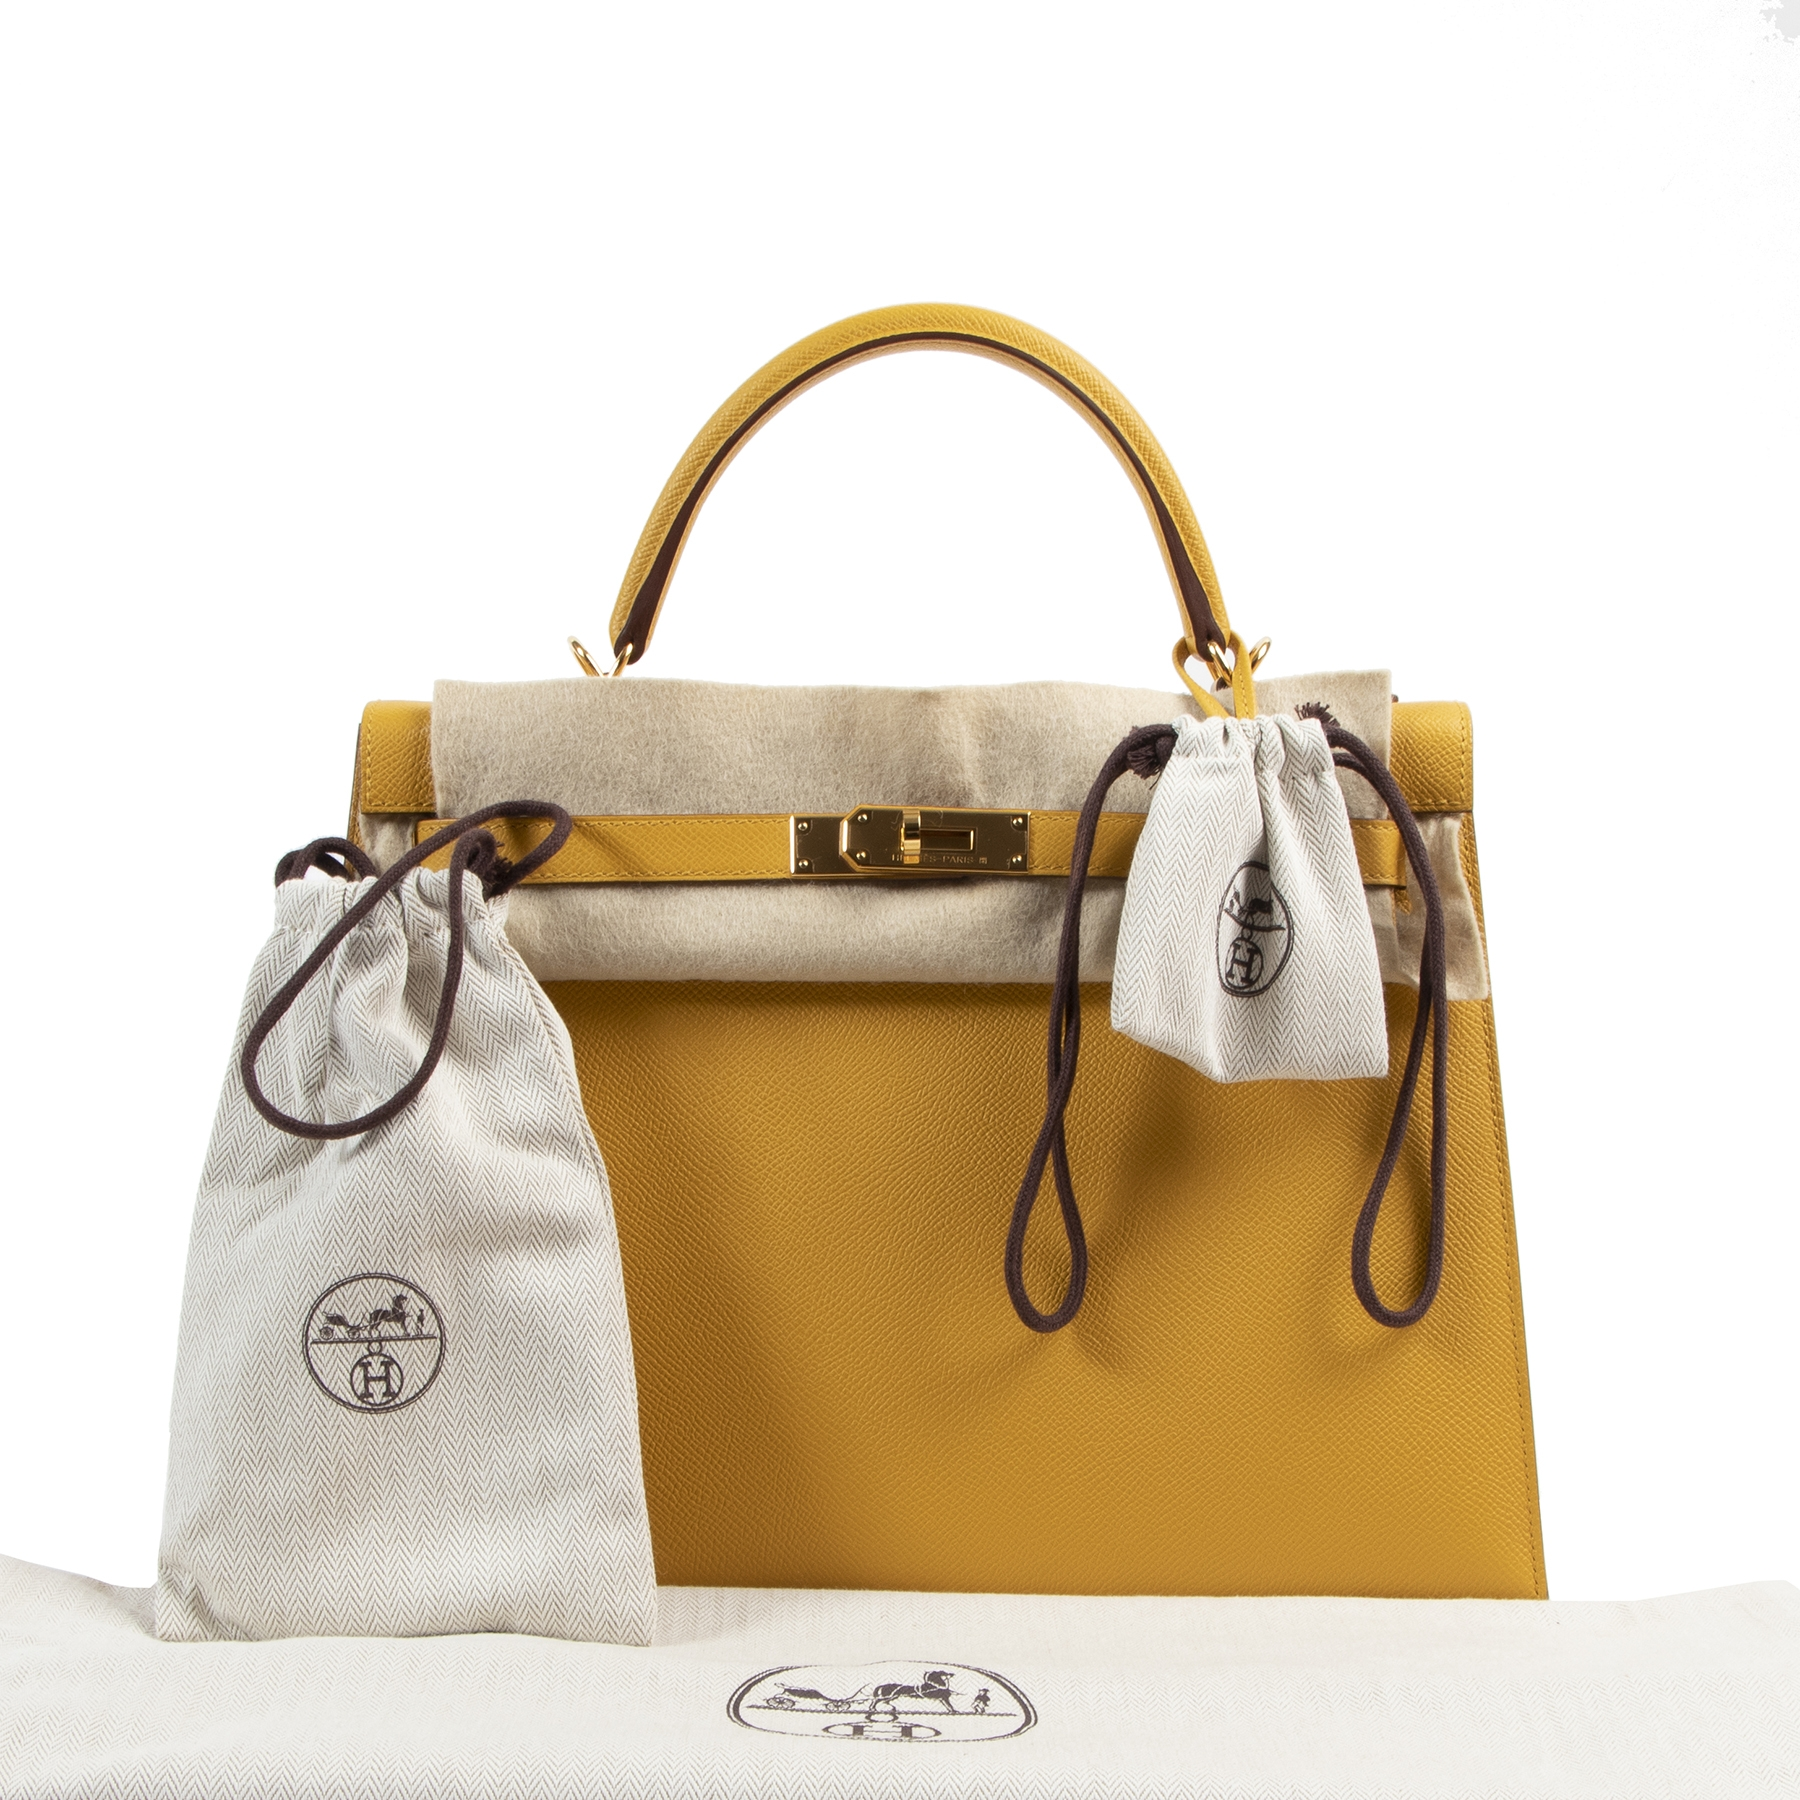 Koop en verkoop uw authentieke designer Hermès Kelly 32 Jaune Ambre Veau Epsom GHW